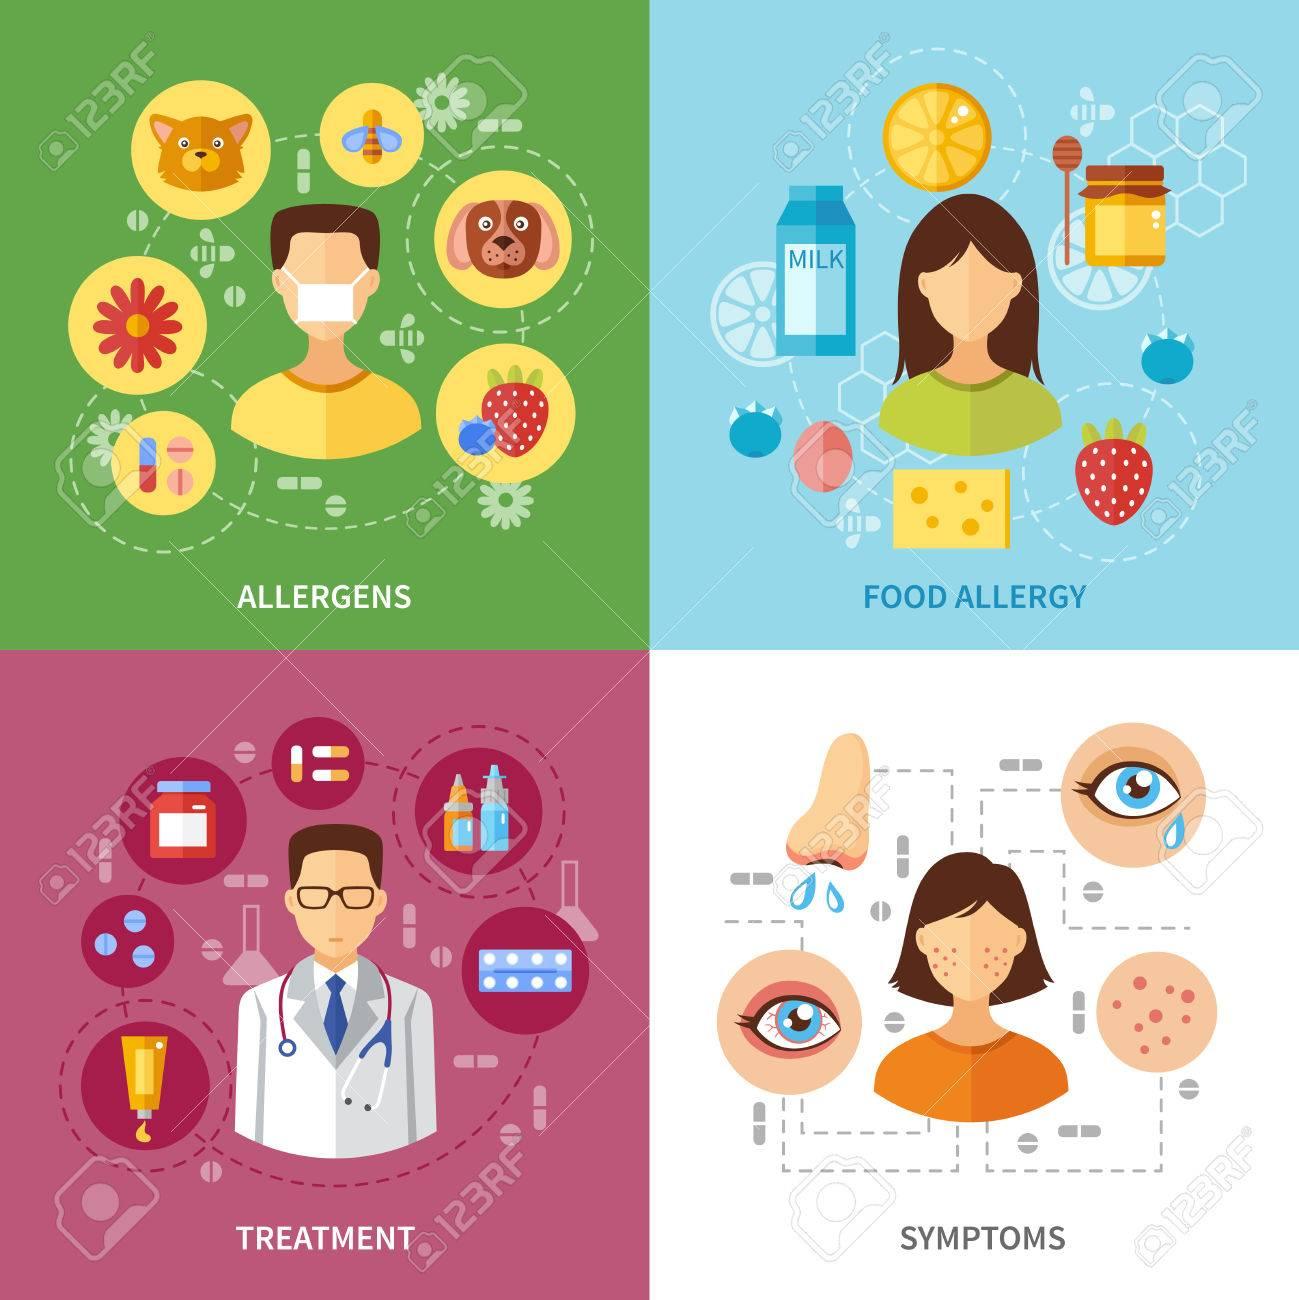 types d'allergies et traitements.jpg